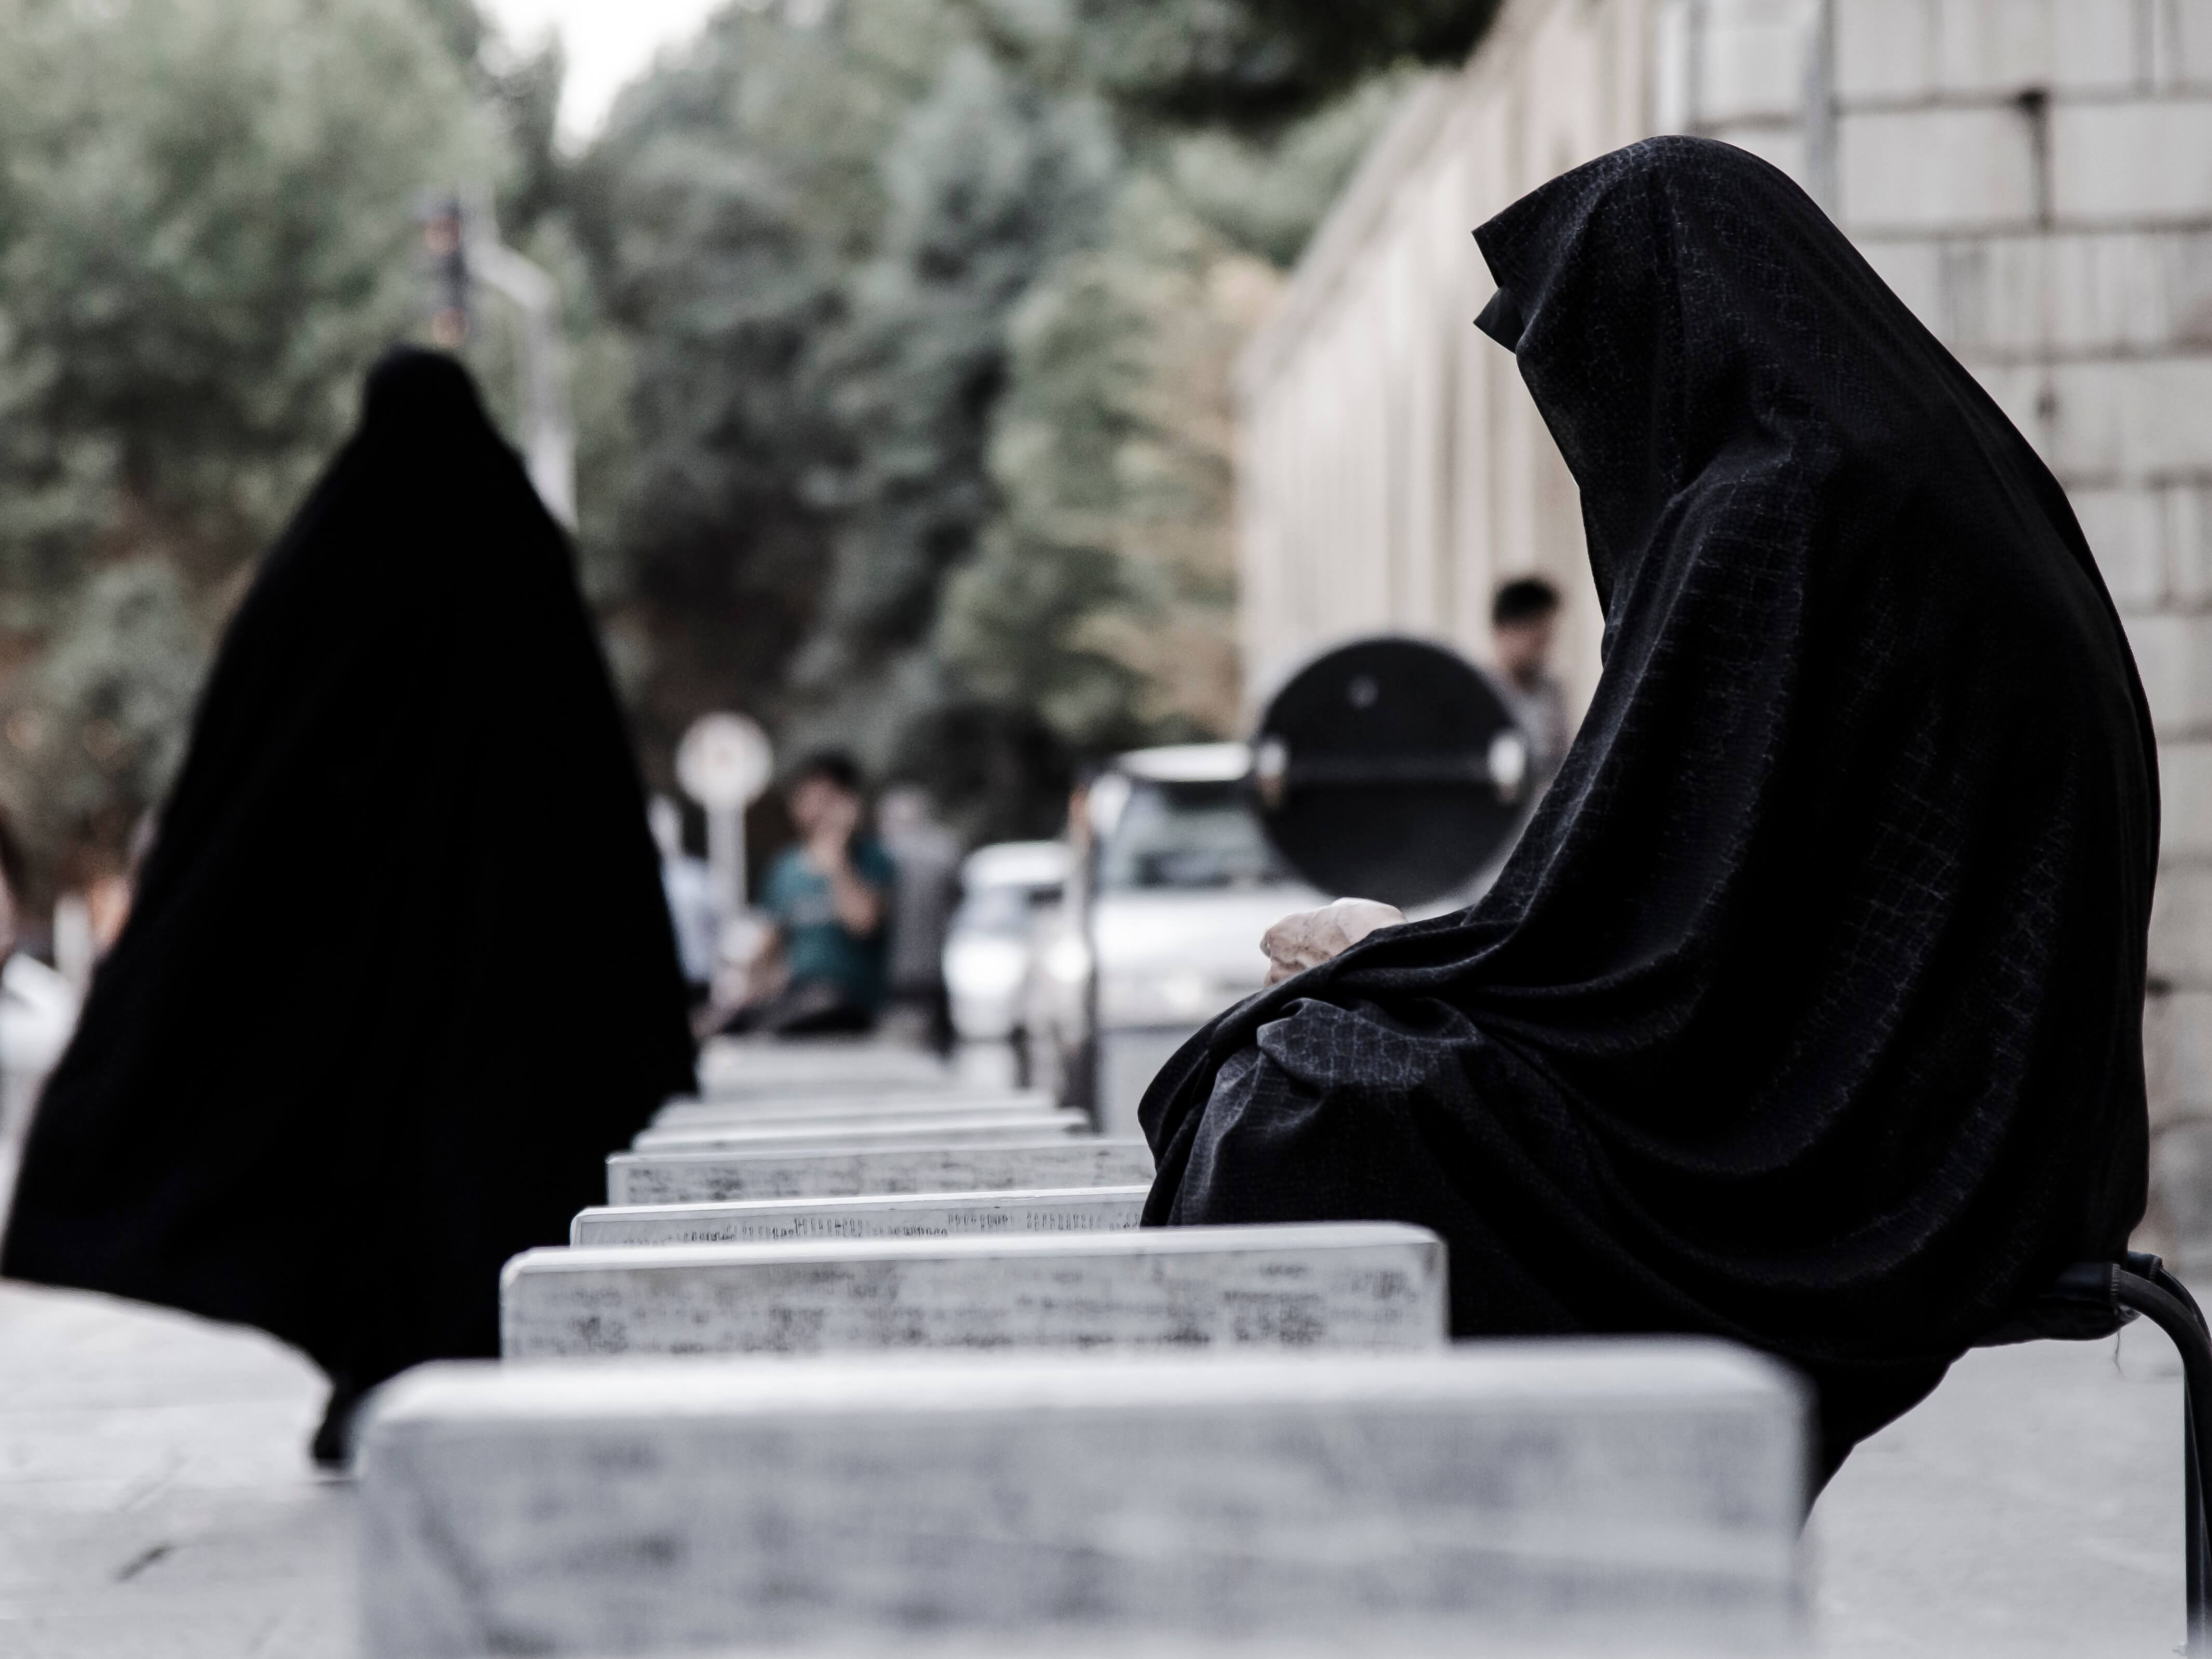 Burka, niqab